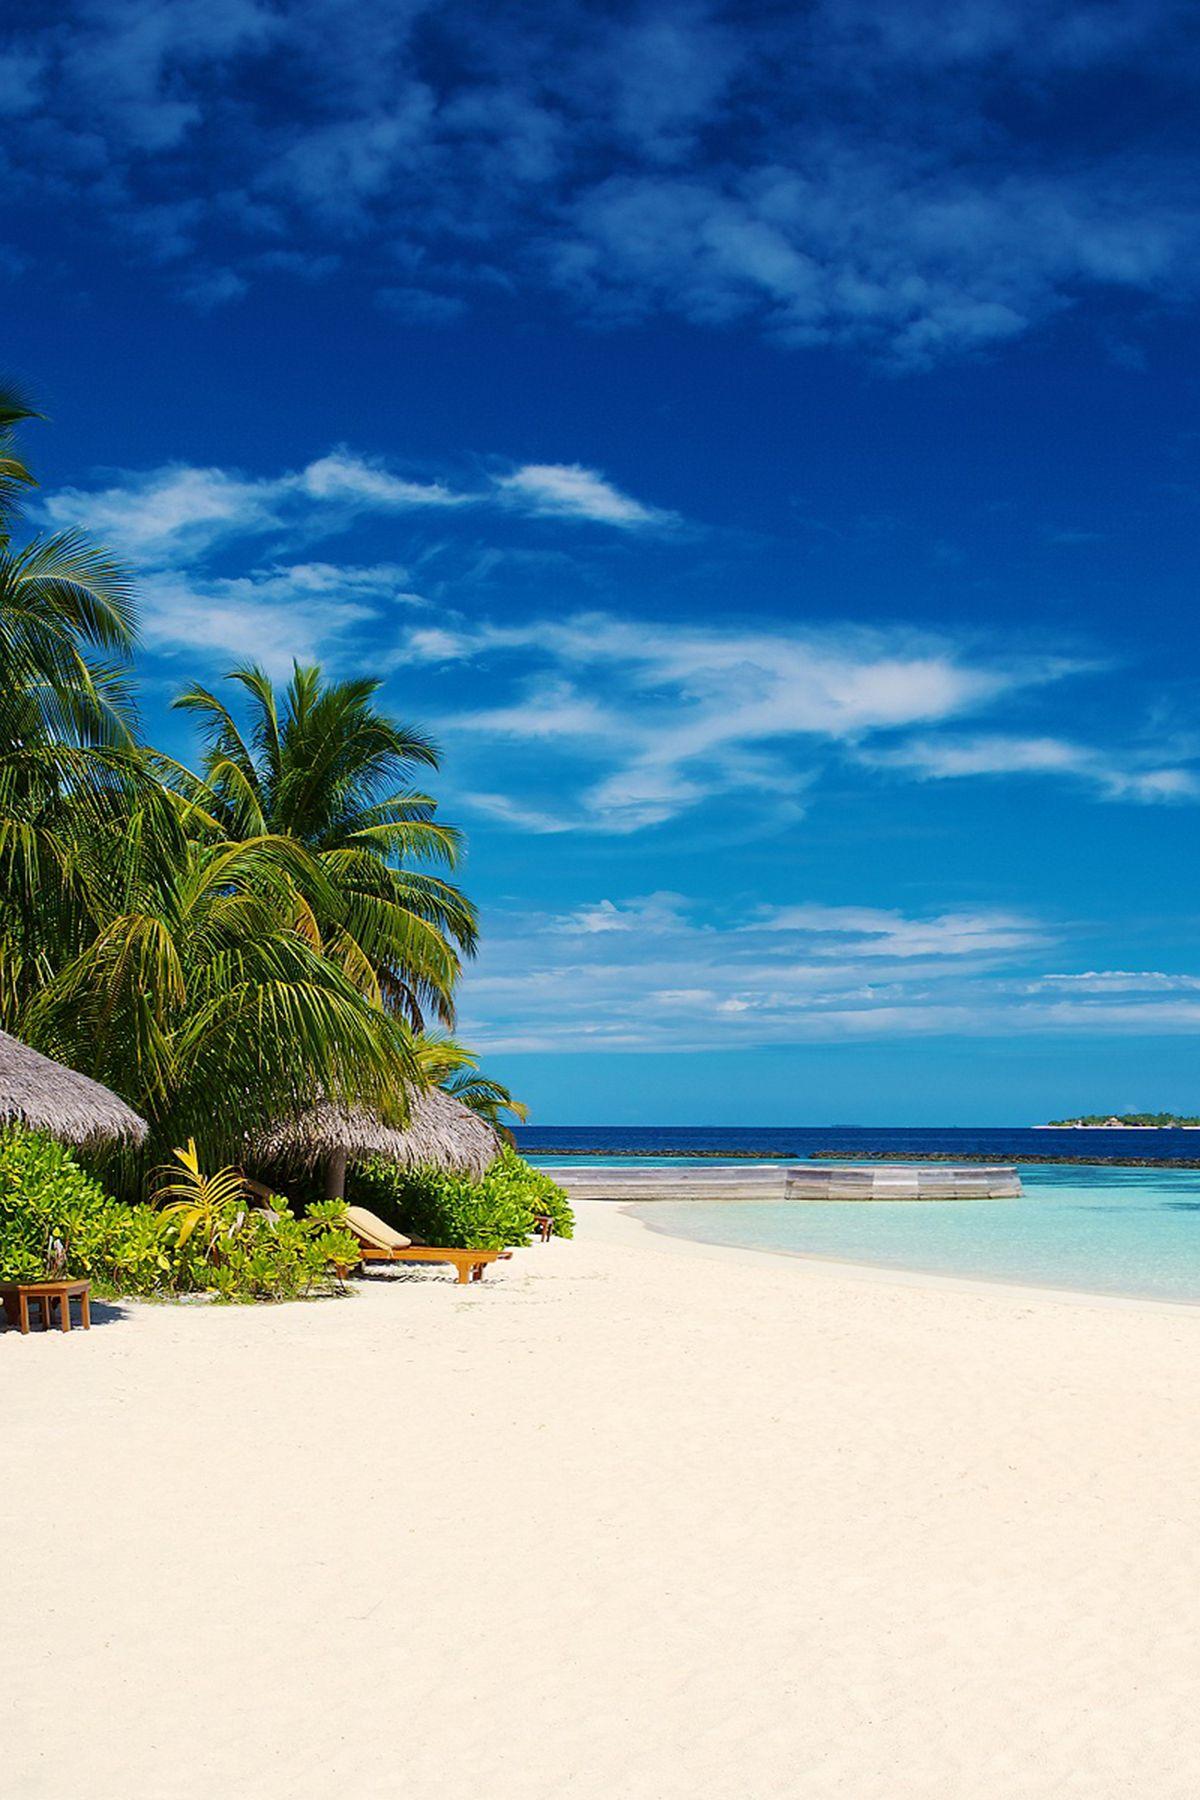 Beautiful Beach Nature And Blue Sky Hd Mobile Wallpaper Natural Beautiful Beach Nature Blue Iphone Andr Beautiful Beaches Maldives Island Visit Maldives